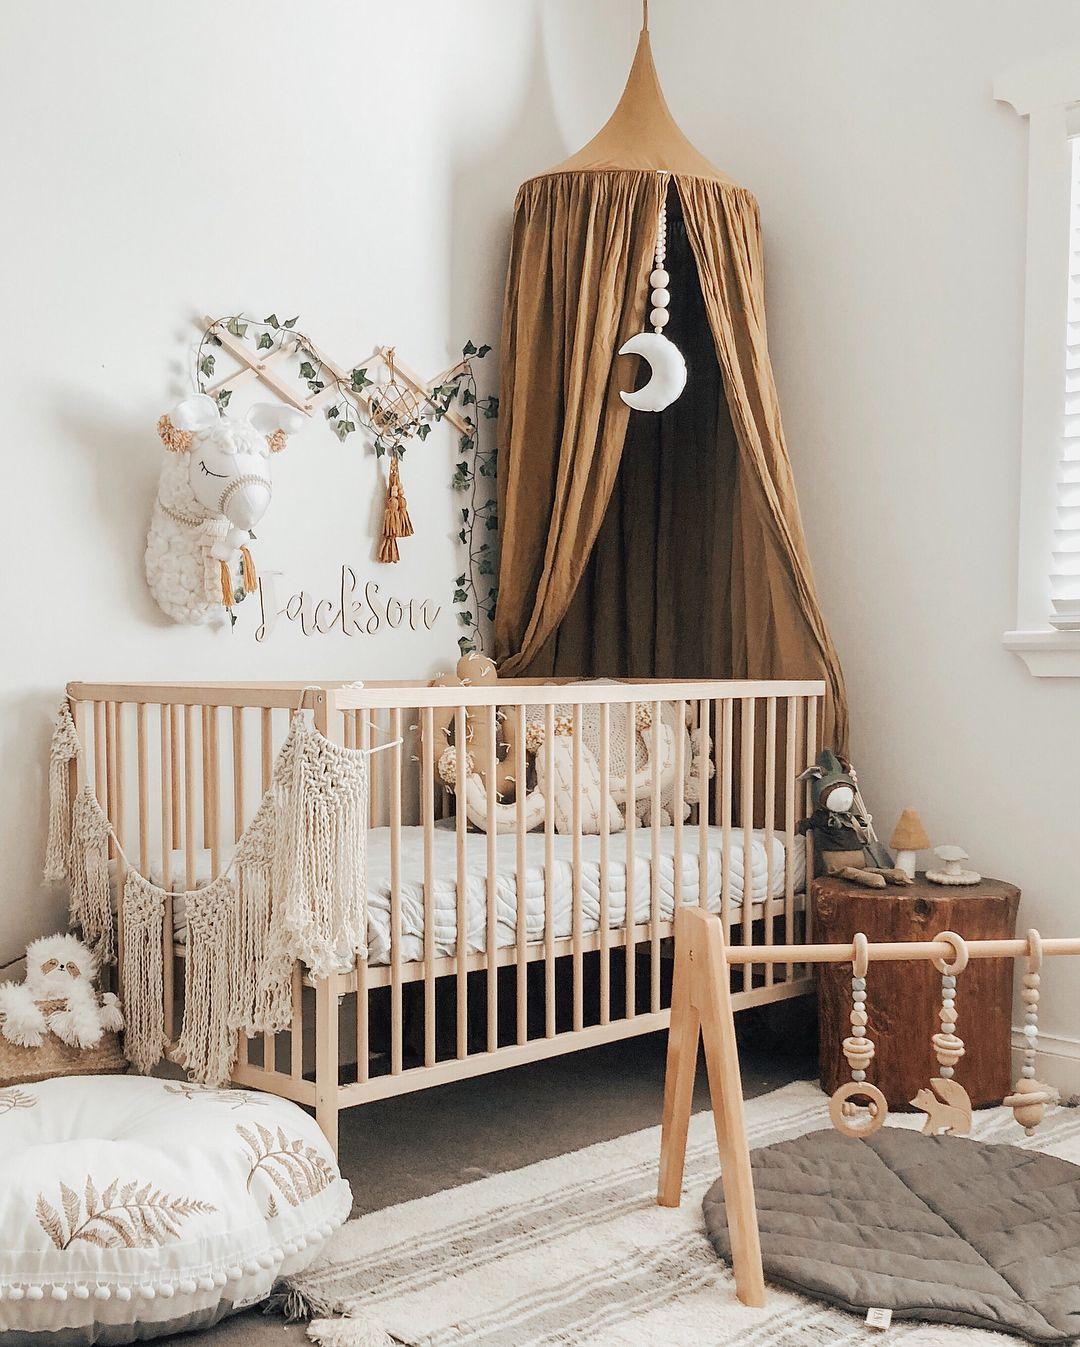 Boho Nursery Llama Nursery Cactus Nursery Boy Nursery Gender Neutral Nursery Decor Baby Nursery Neutral Nurs Baby Nursery Inspiration Baby Nursery Baby Bedroom